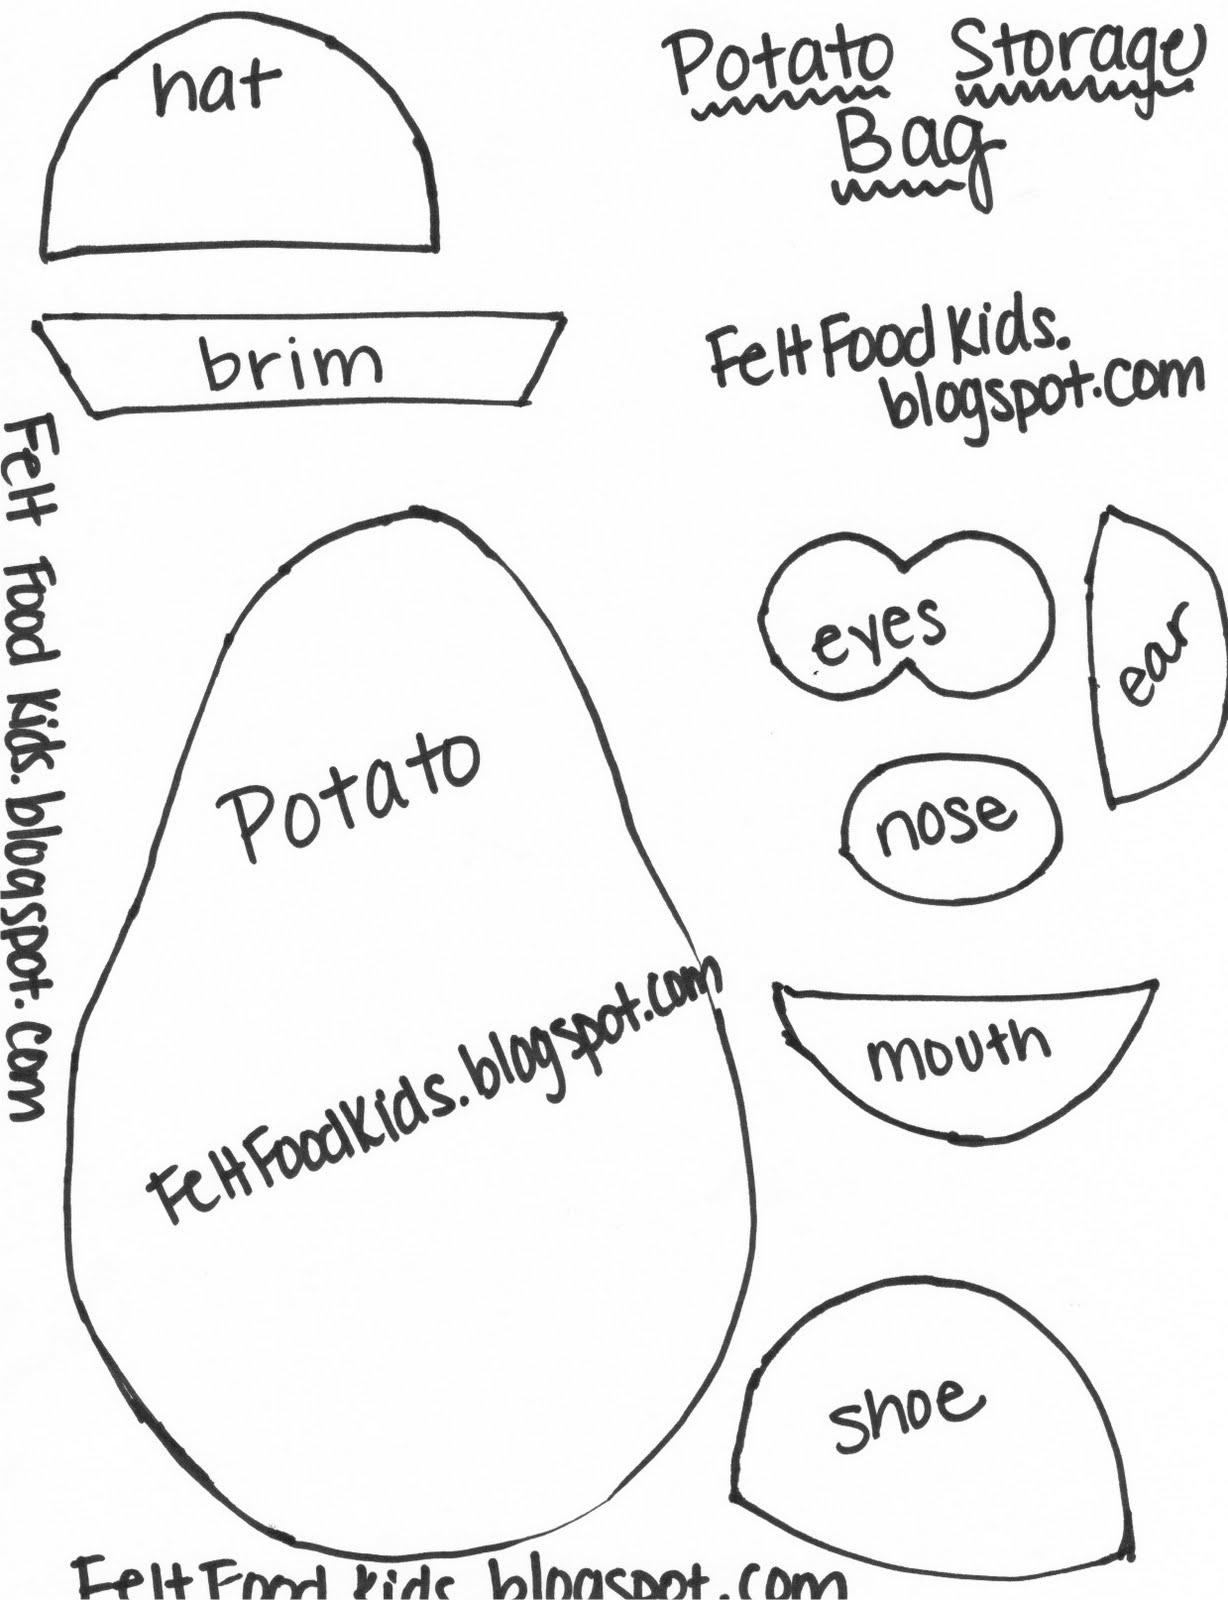 Felt Food Kids Potato Toy Parts Storage Bag Tutorial